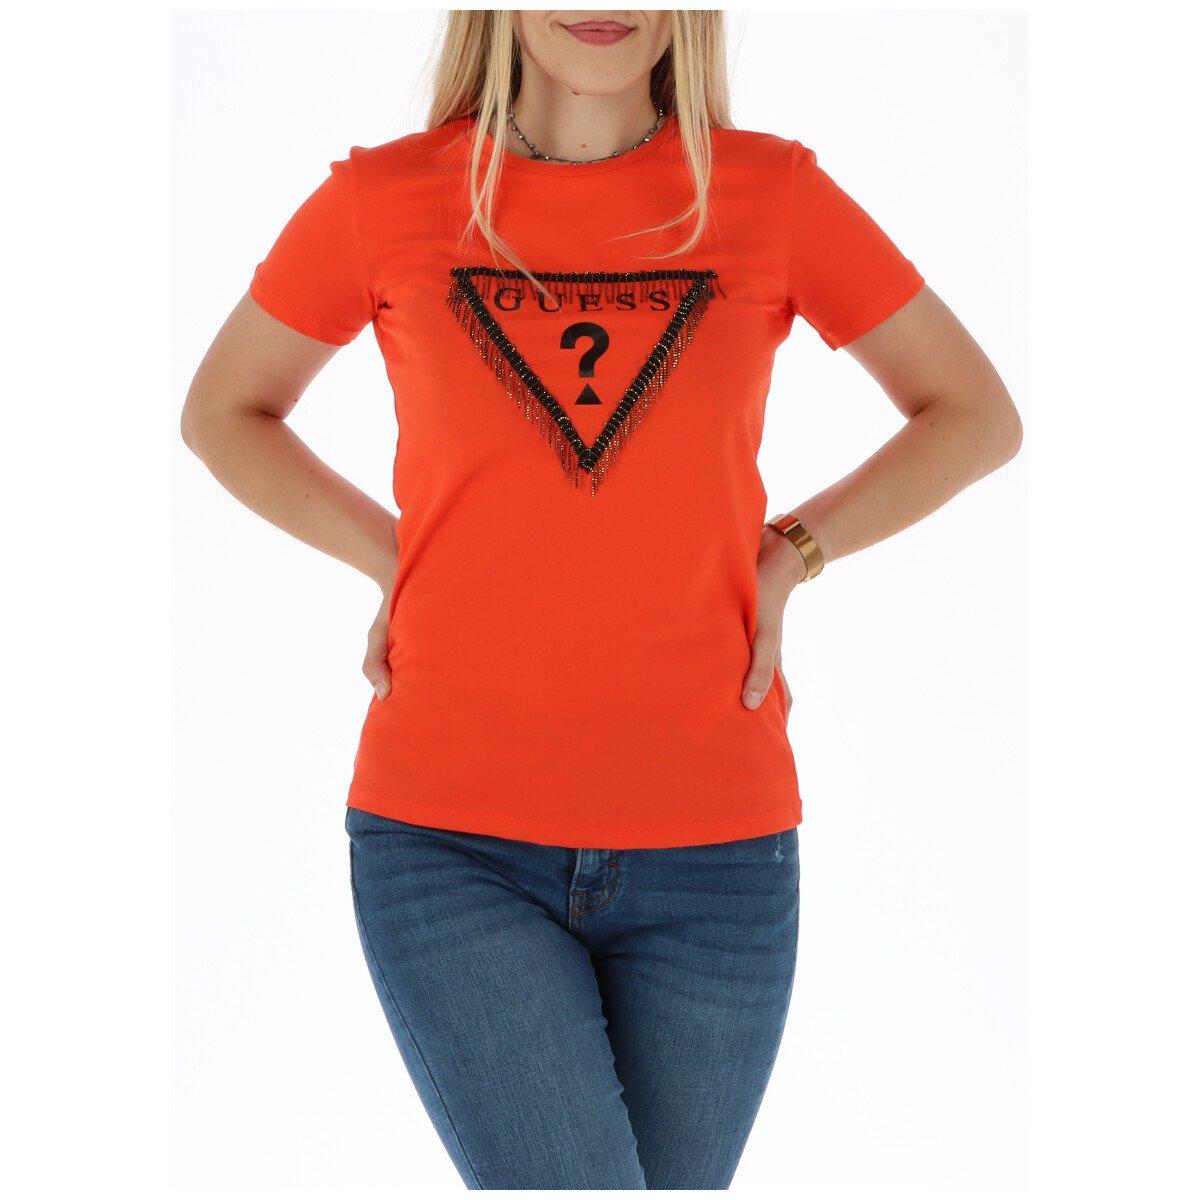 Guess Women's T-Shirt Various Colours 301091 - coral XS